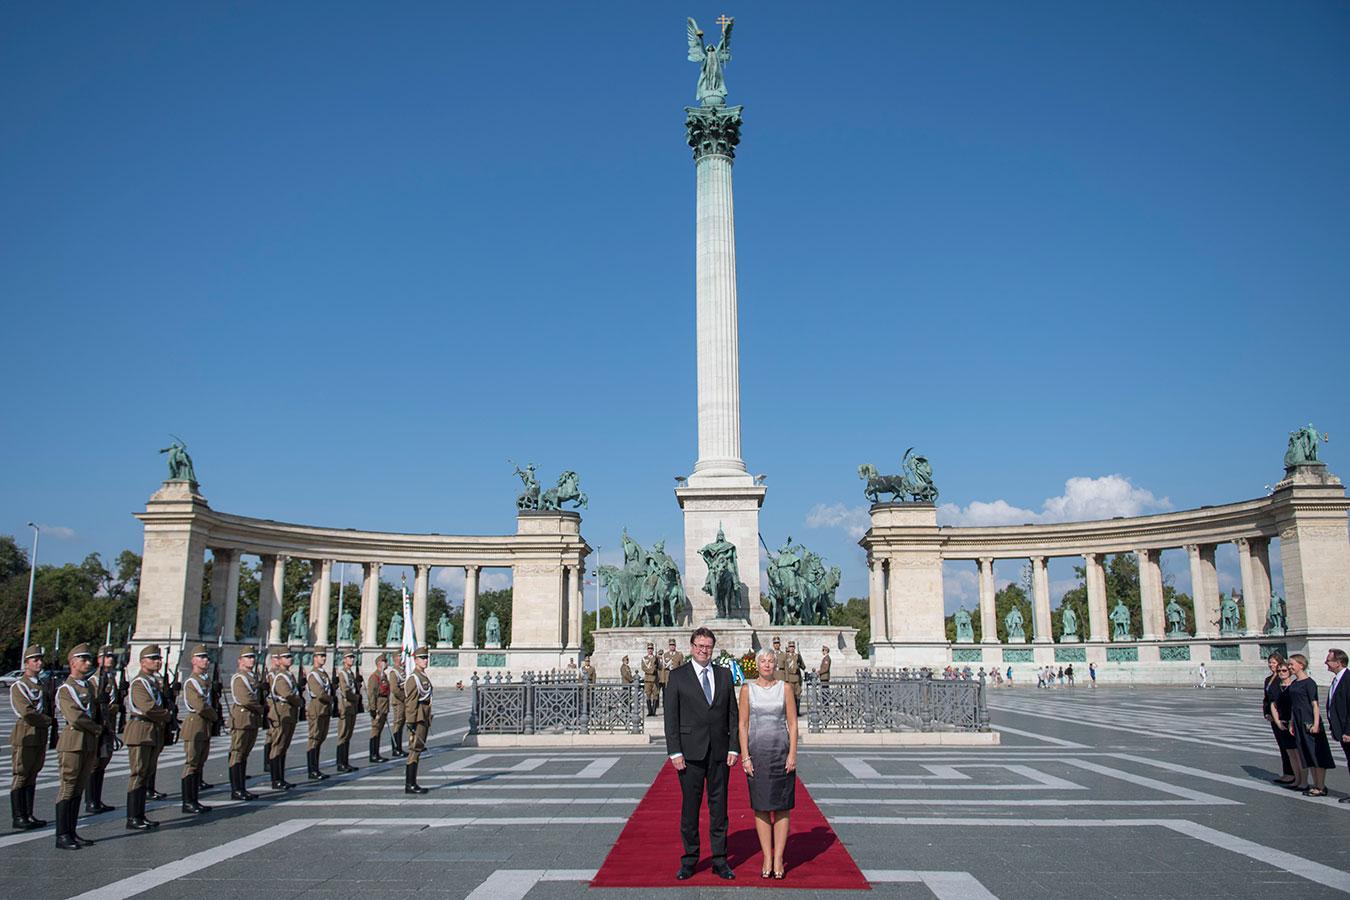 fin-markku-virri-wreath-ceremony-heroes-square.jpg